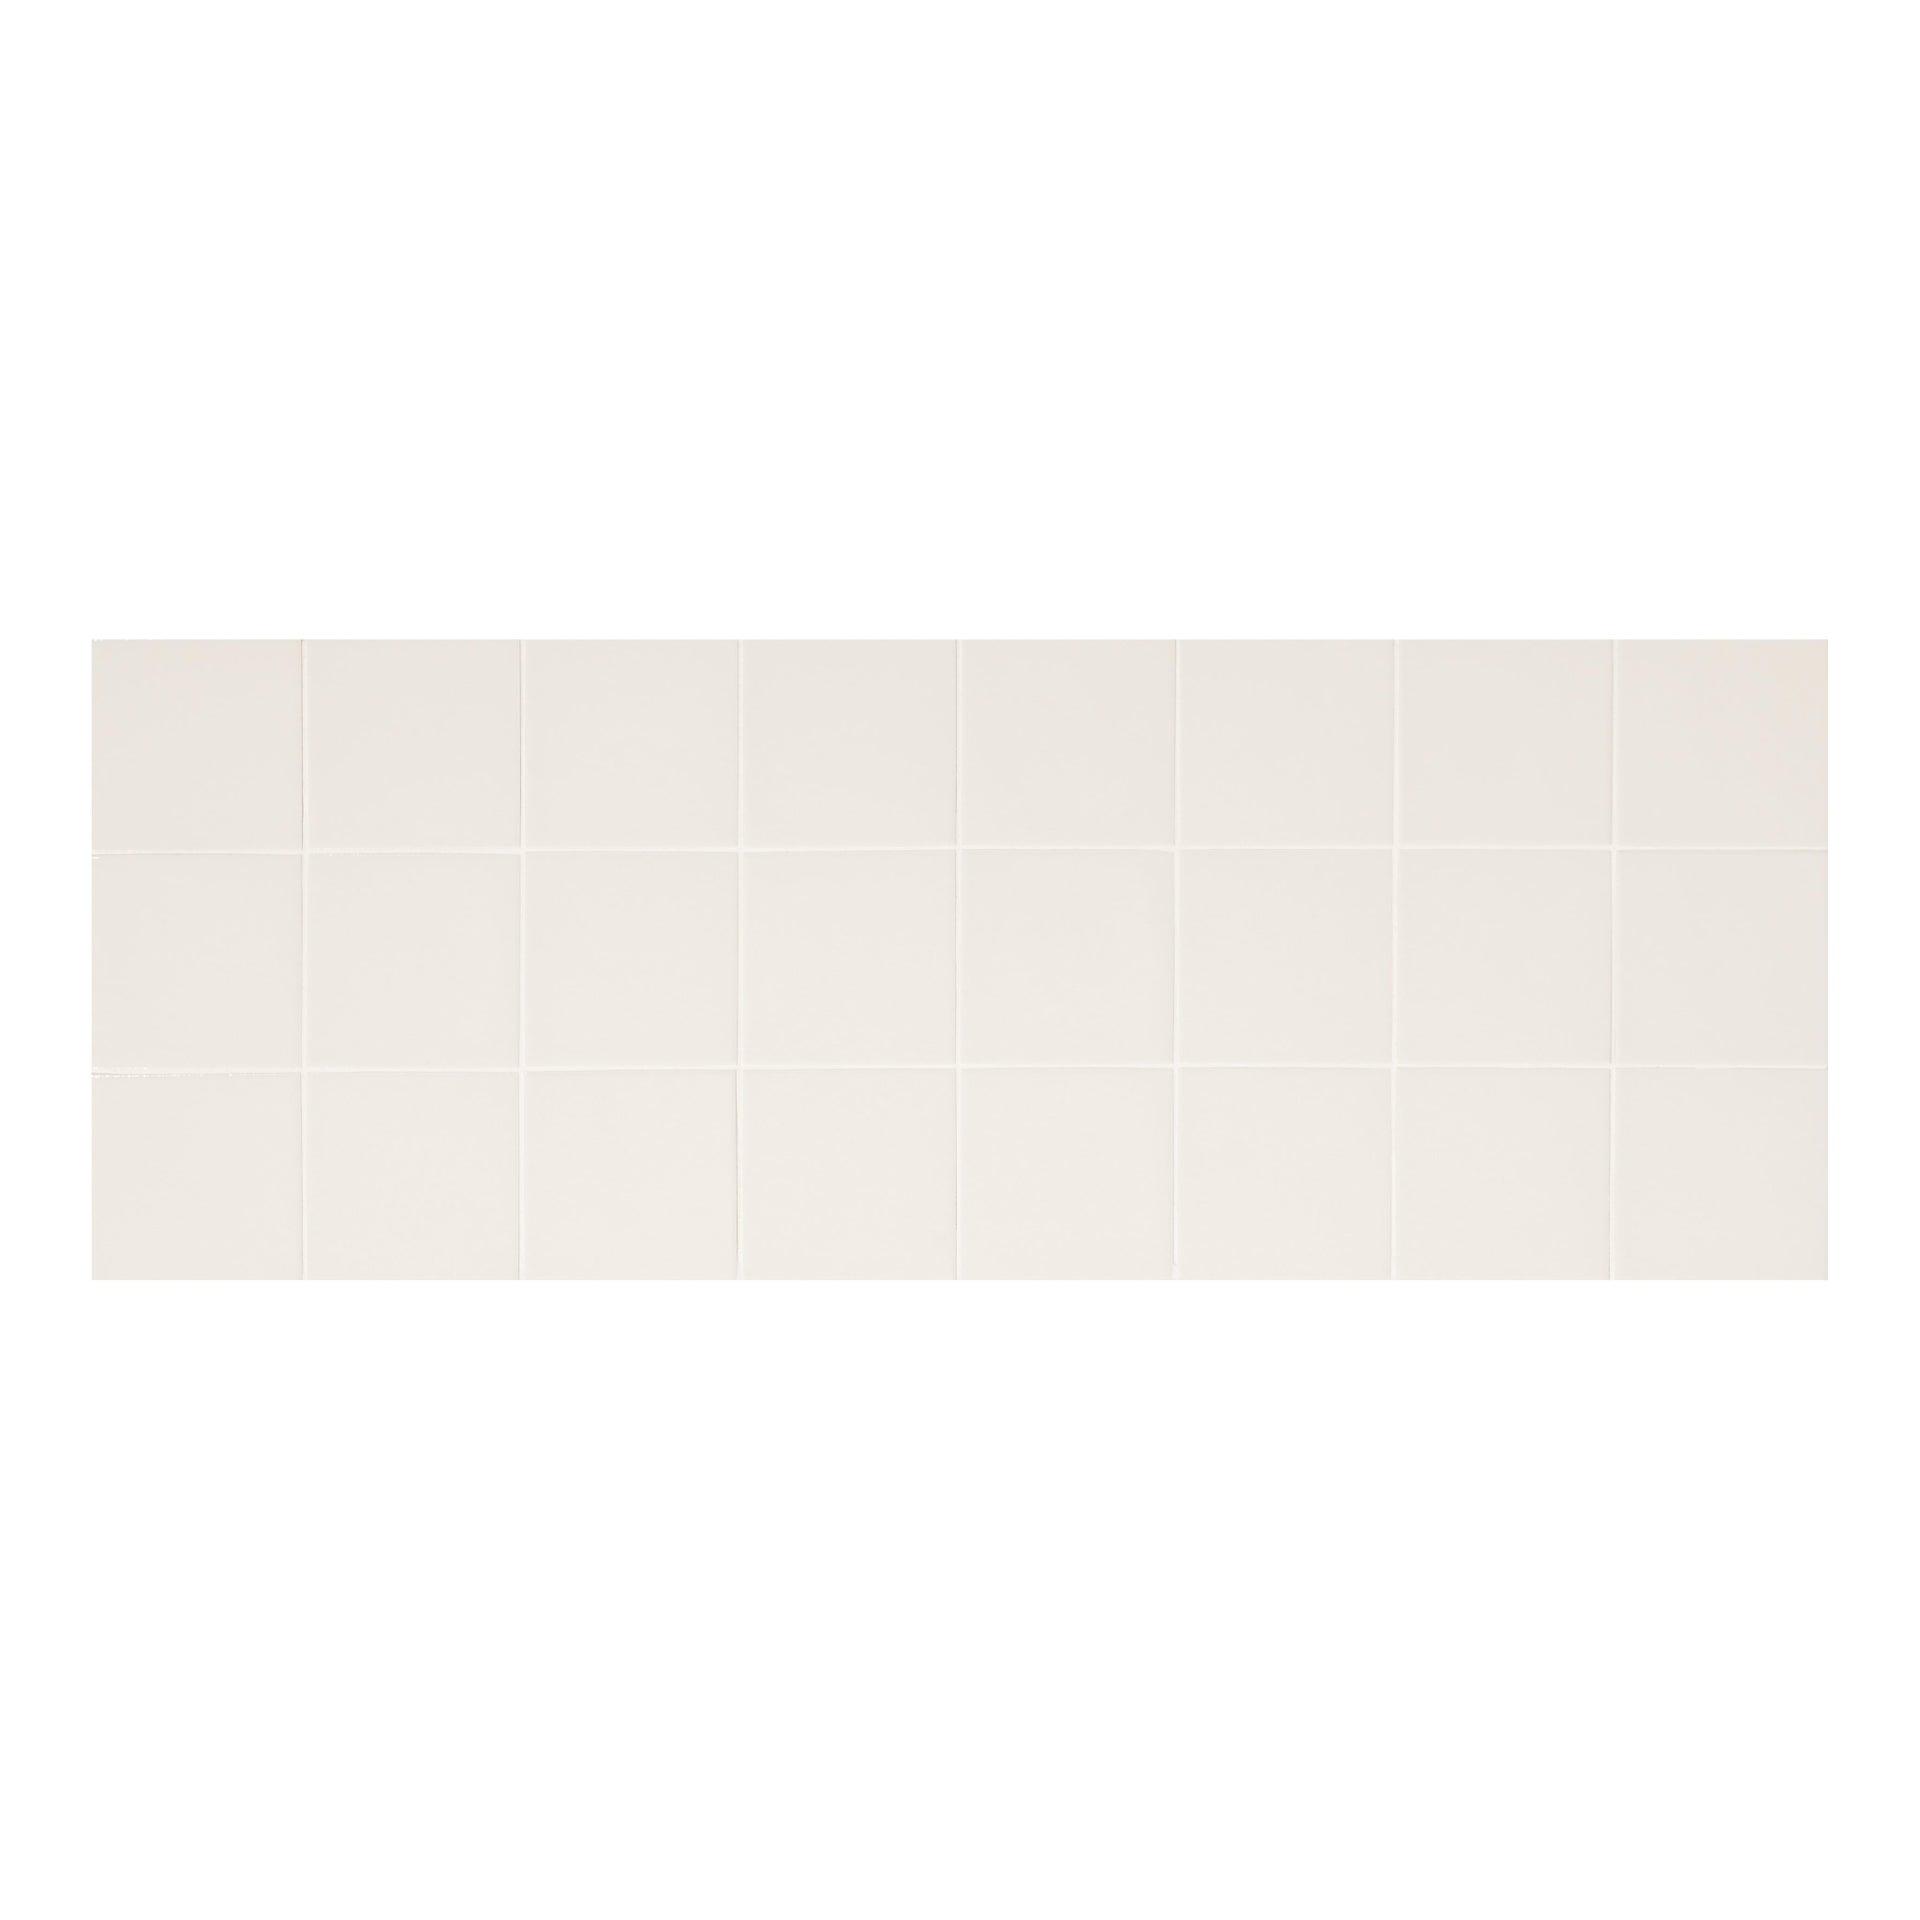 Piastrella per rivestimenti Shape 10 x 10 cm sp. 8 mm bianco - 1